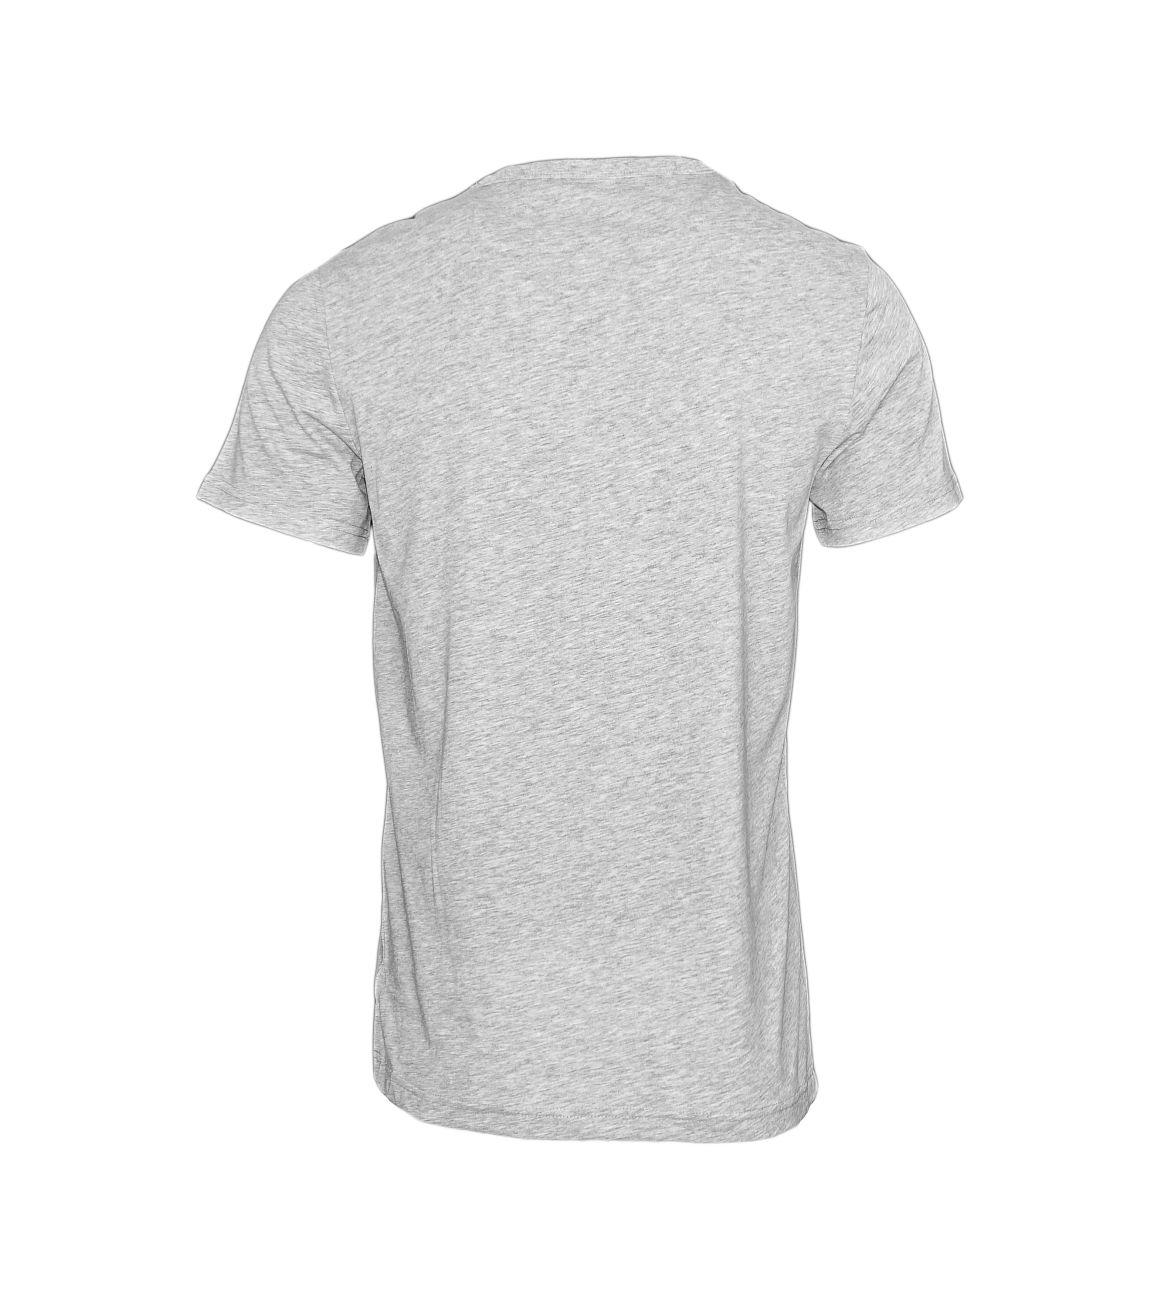 G-Star RAW T-Shirt Cadulor rt D08510.2757.906 81 Grey Htr F18-GST1